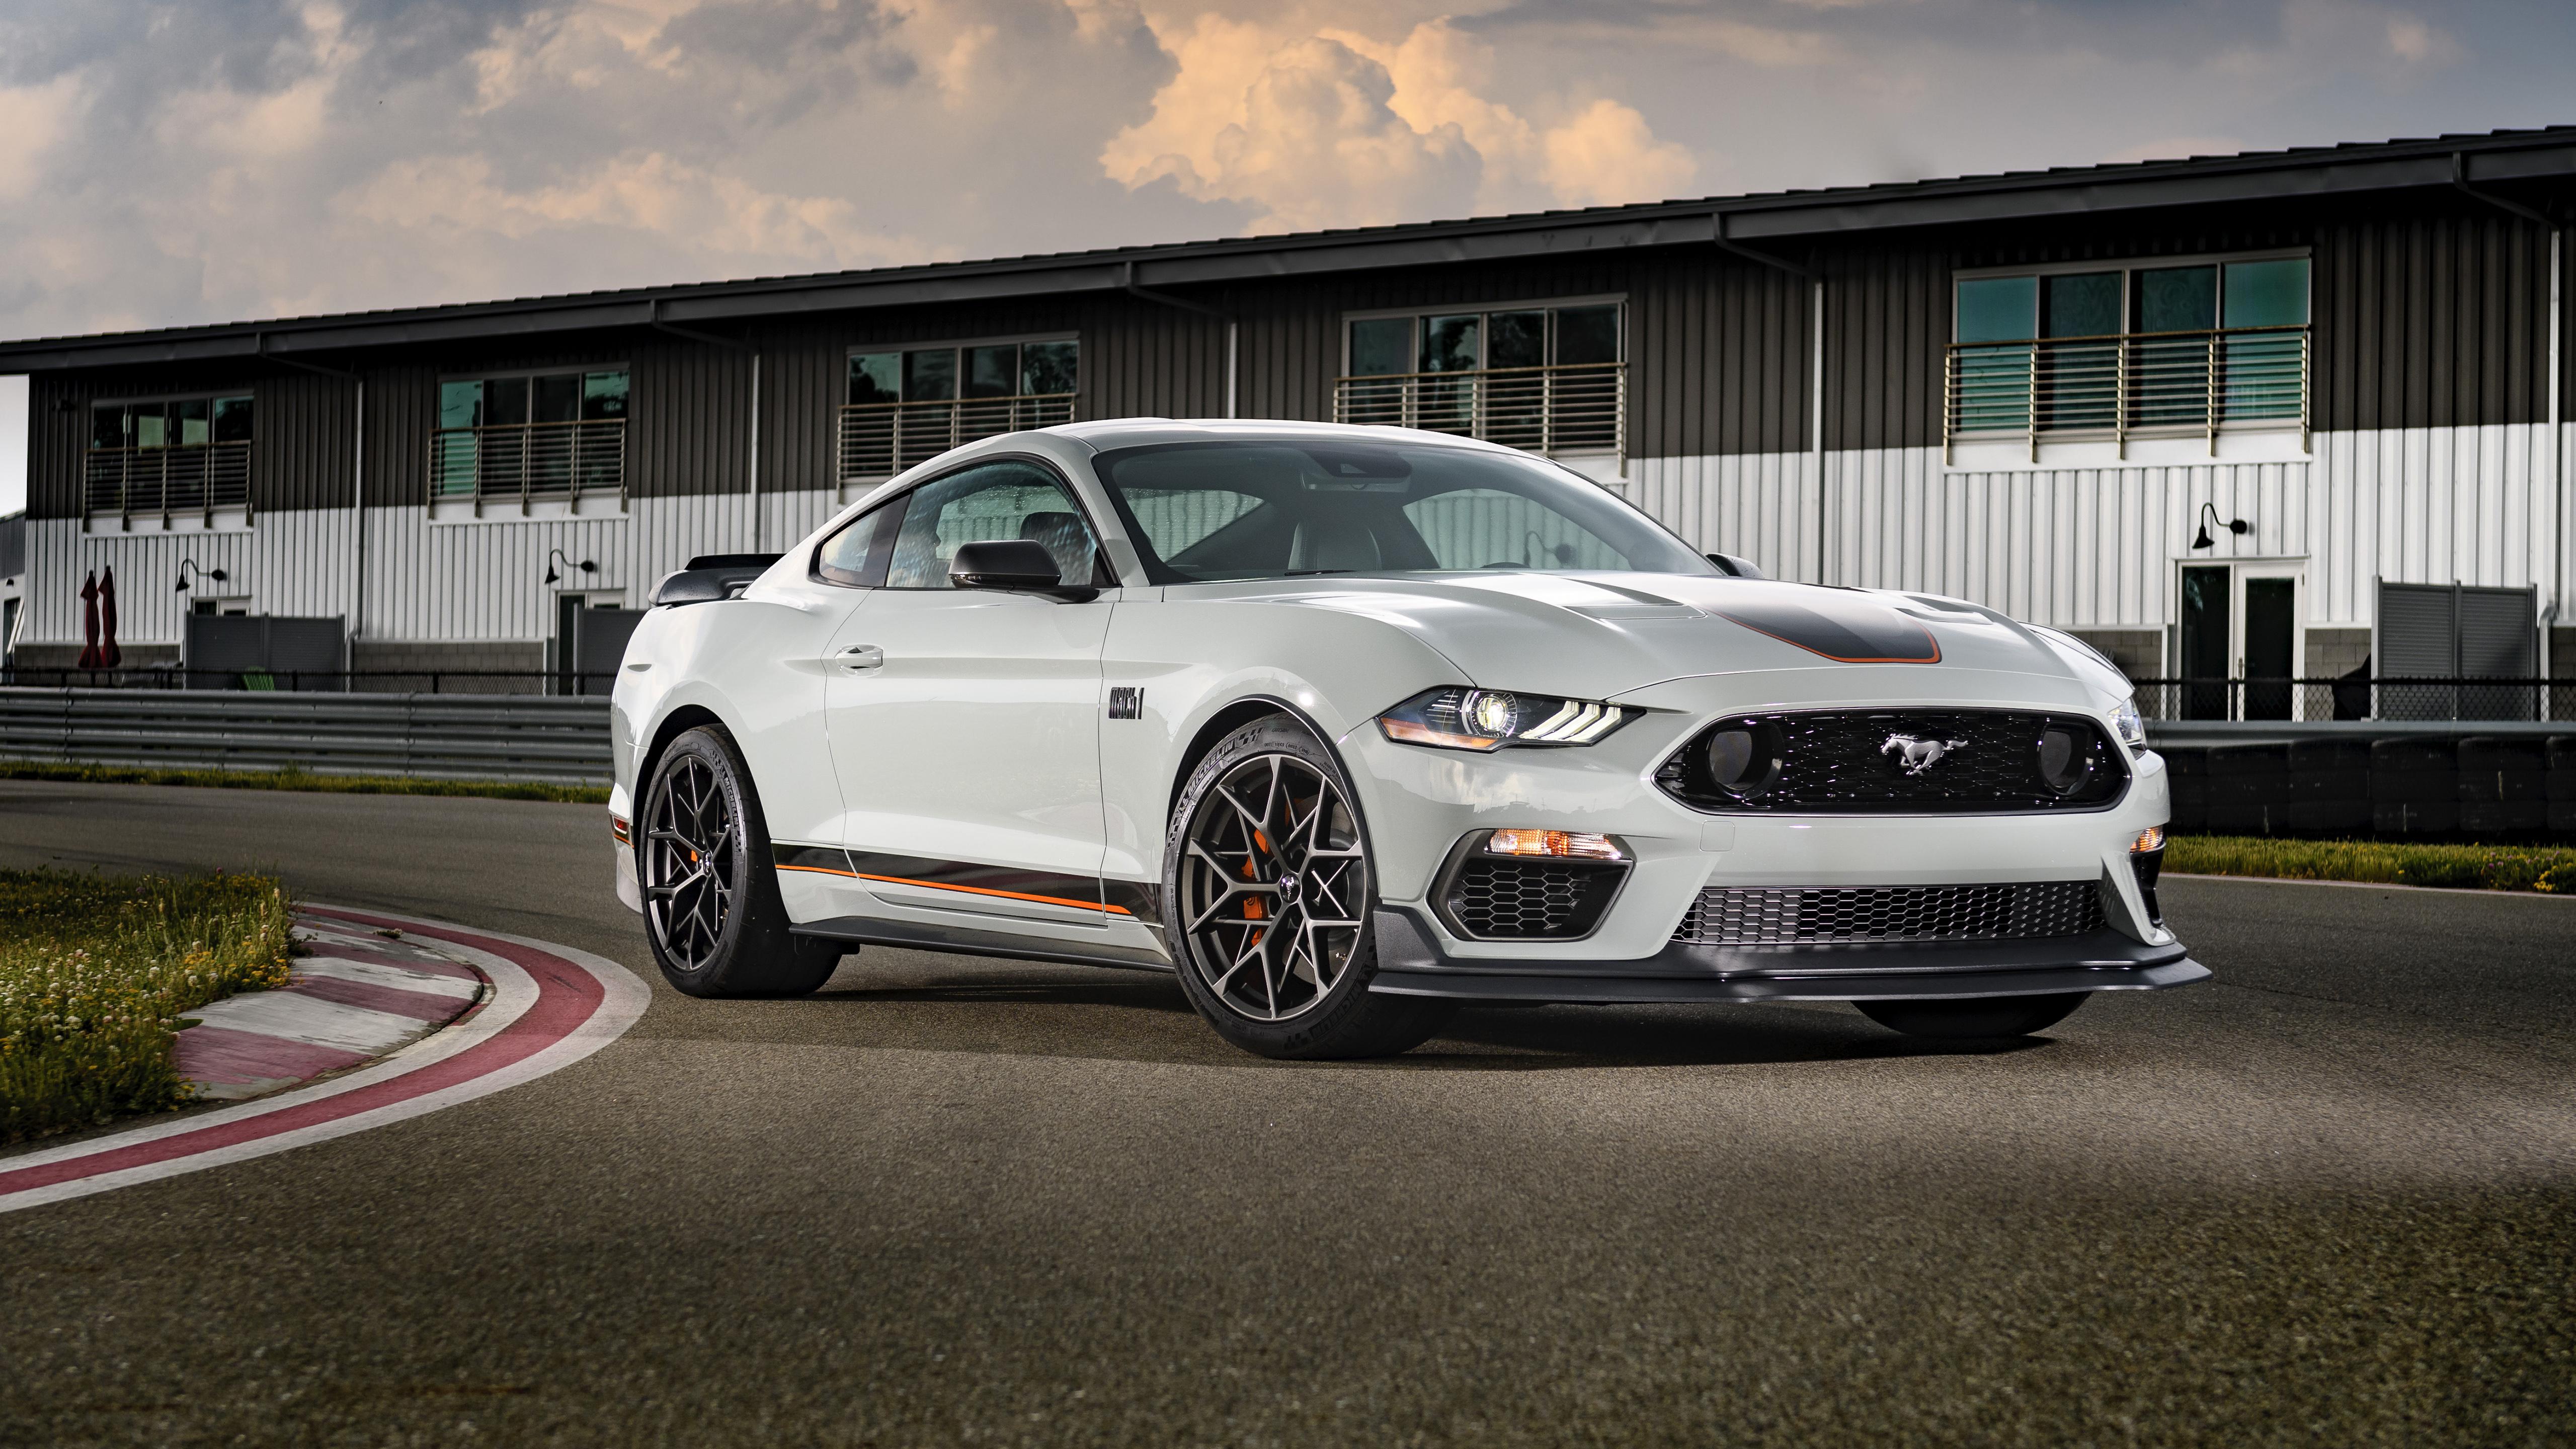 2021 Ford Mustang Mach 1 Handling Package 5k 3 Wallpaper Hd Car Wallpapers Id 15032